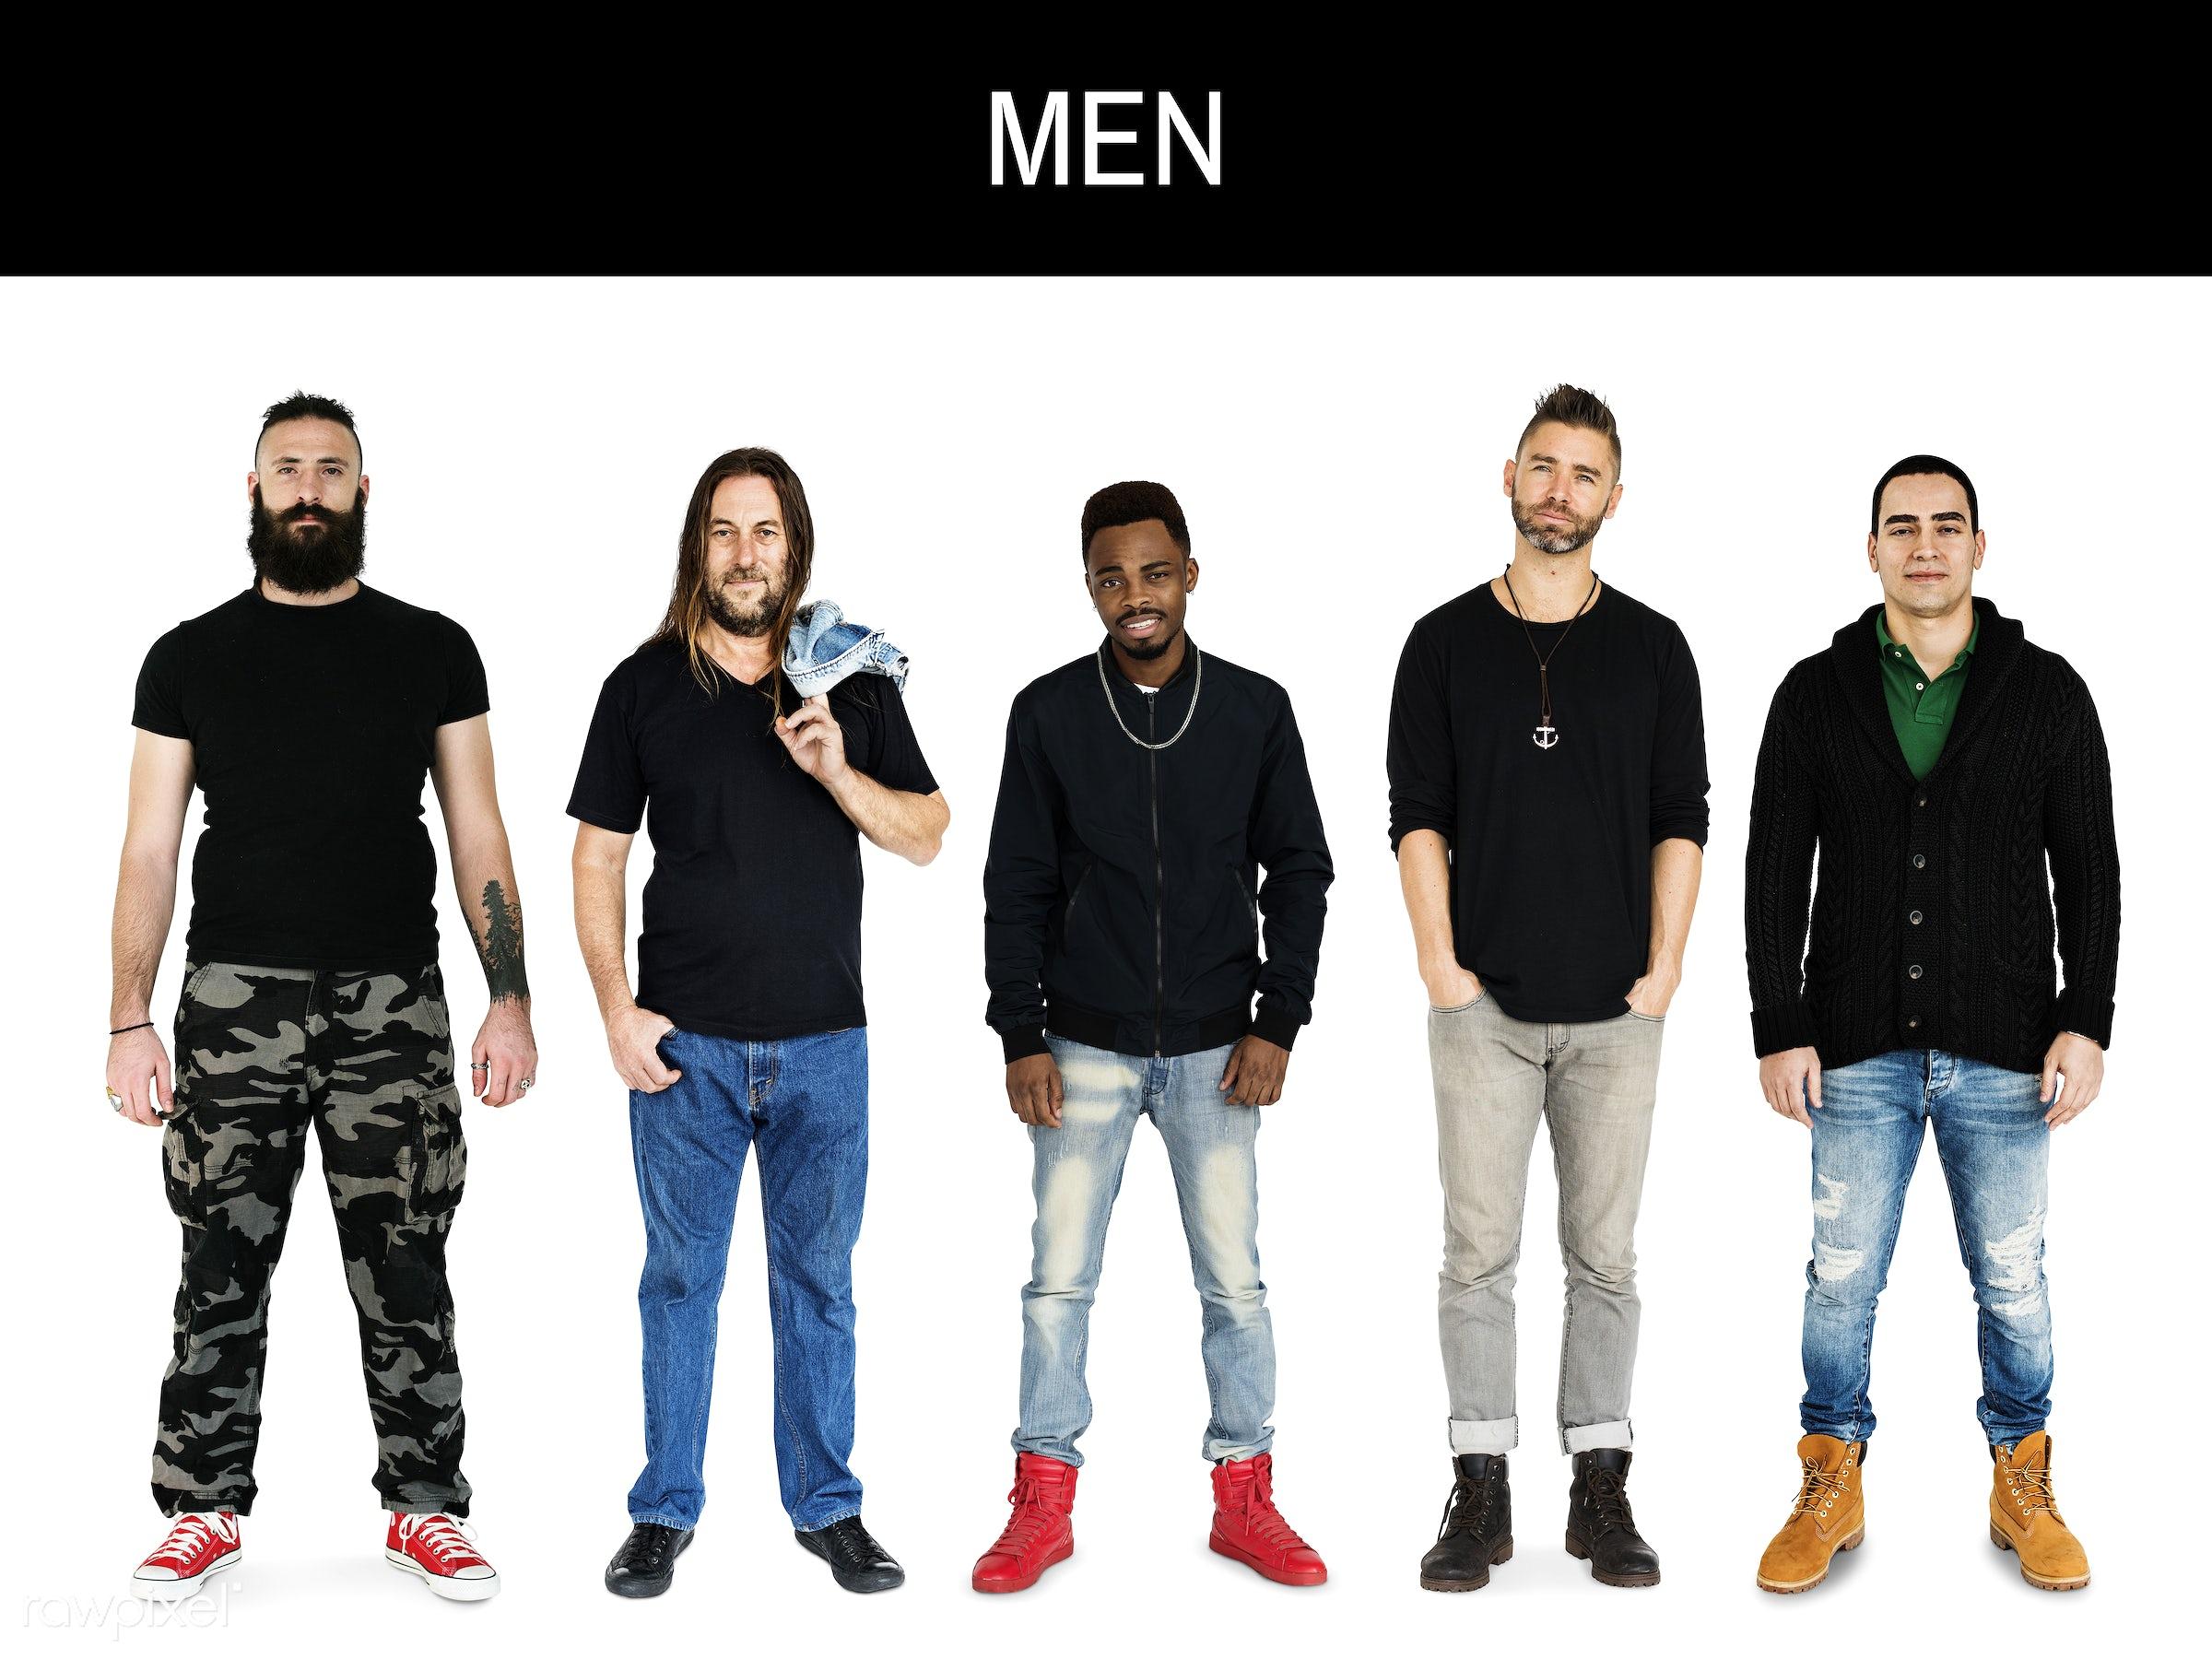 gentlemen, studio, person, diverse, relax, little, people, together, attraction, caucasian, black shirt, lifestyle, studio...